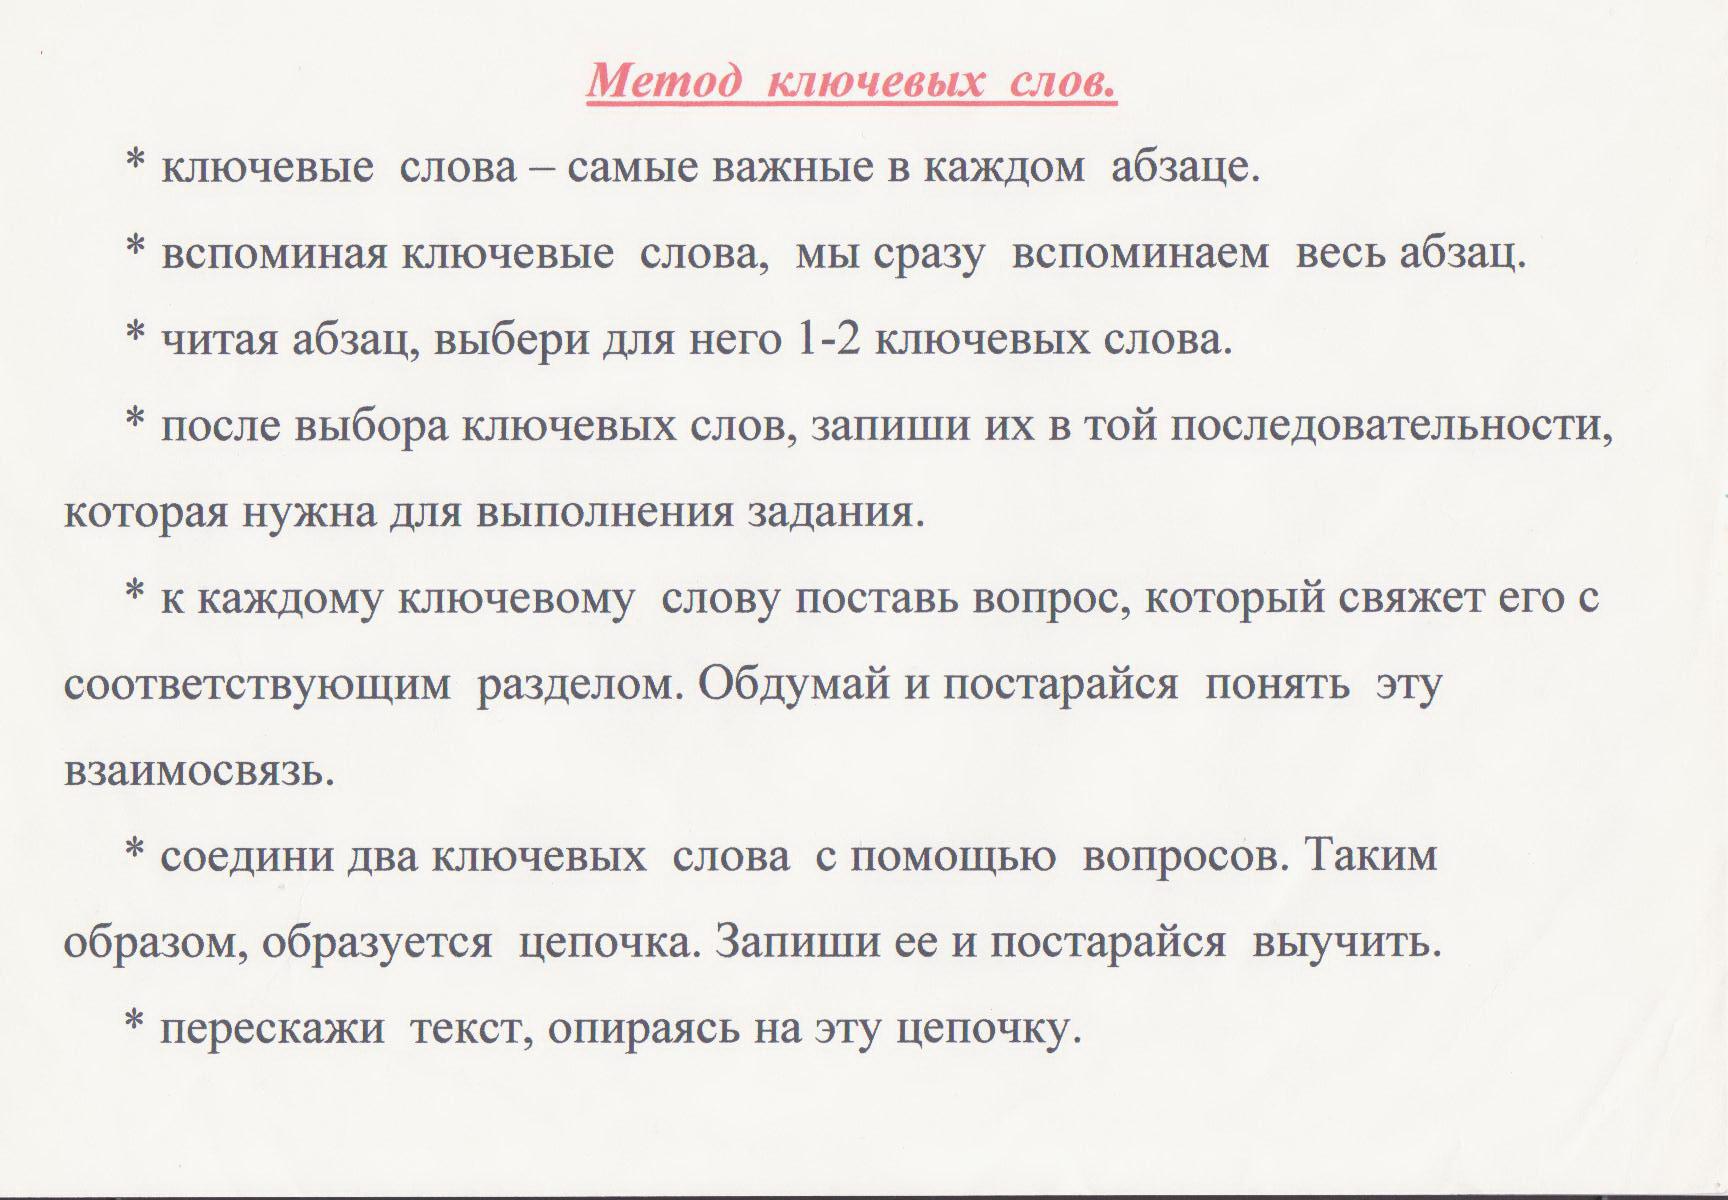 C:\Users\Юля\Desktop\Кузнецова аттестация\сканированные грамоты\Кузнецова 059.jpg